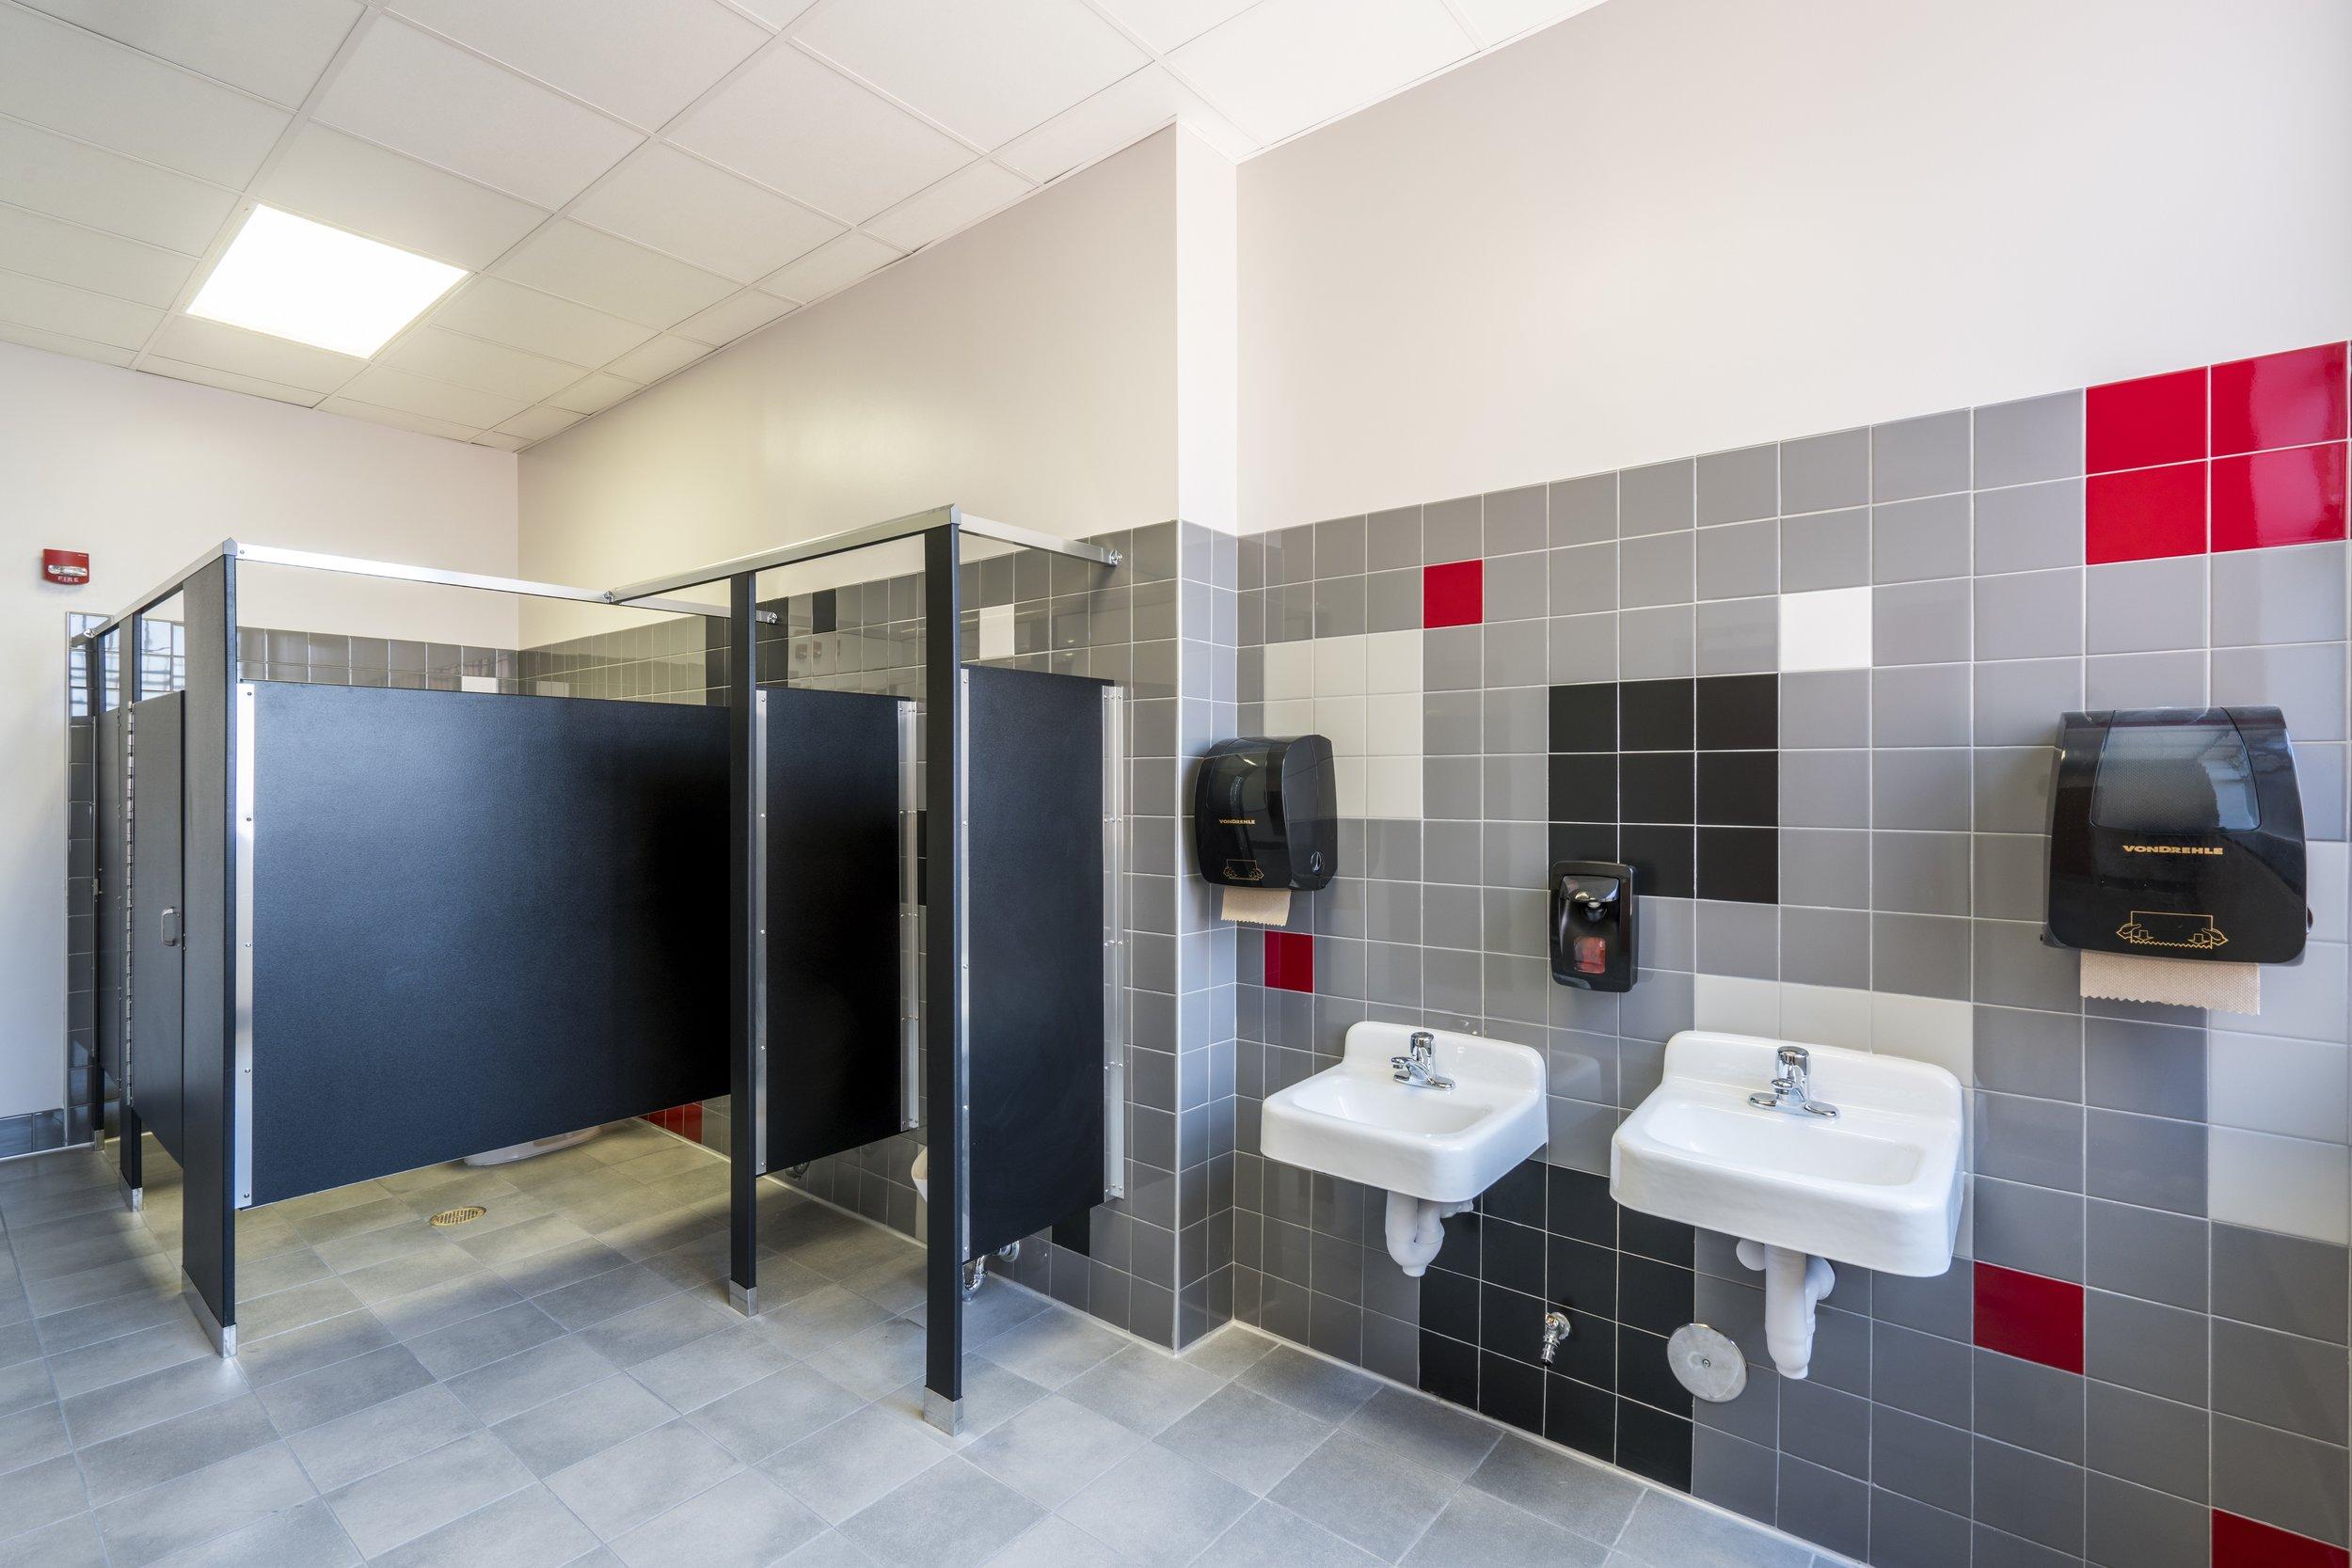 TOILET RENOVATIONS new walls, floors, partitions, fixtures and accessories